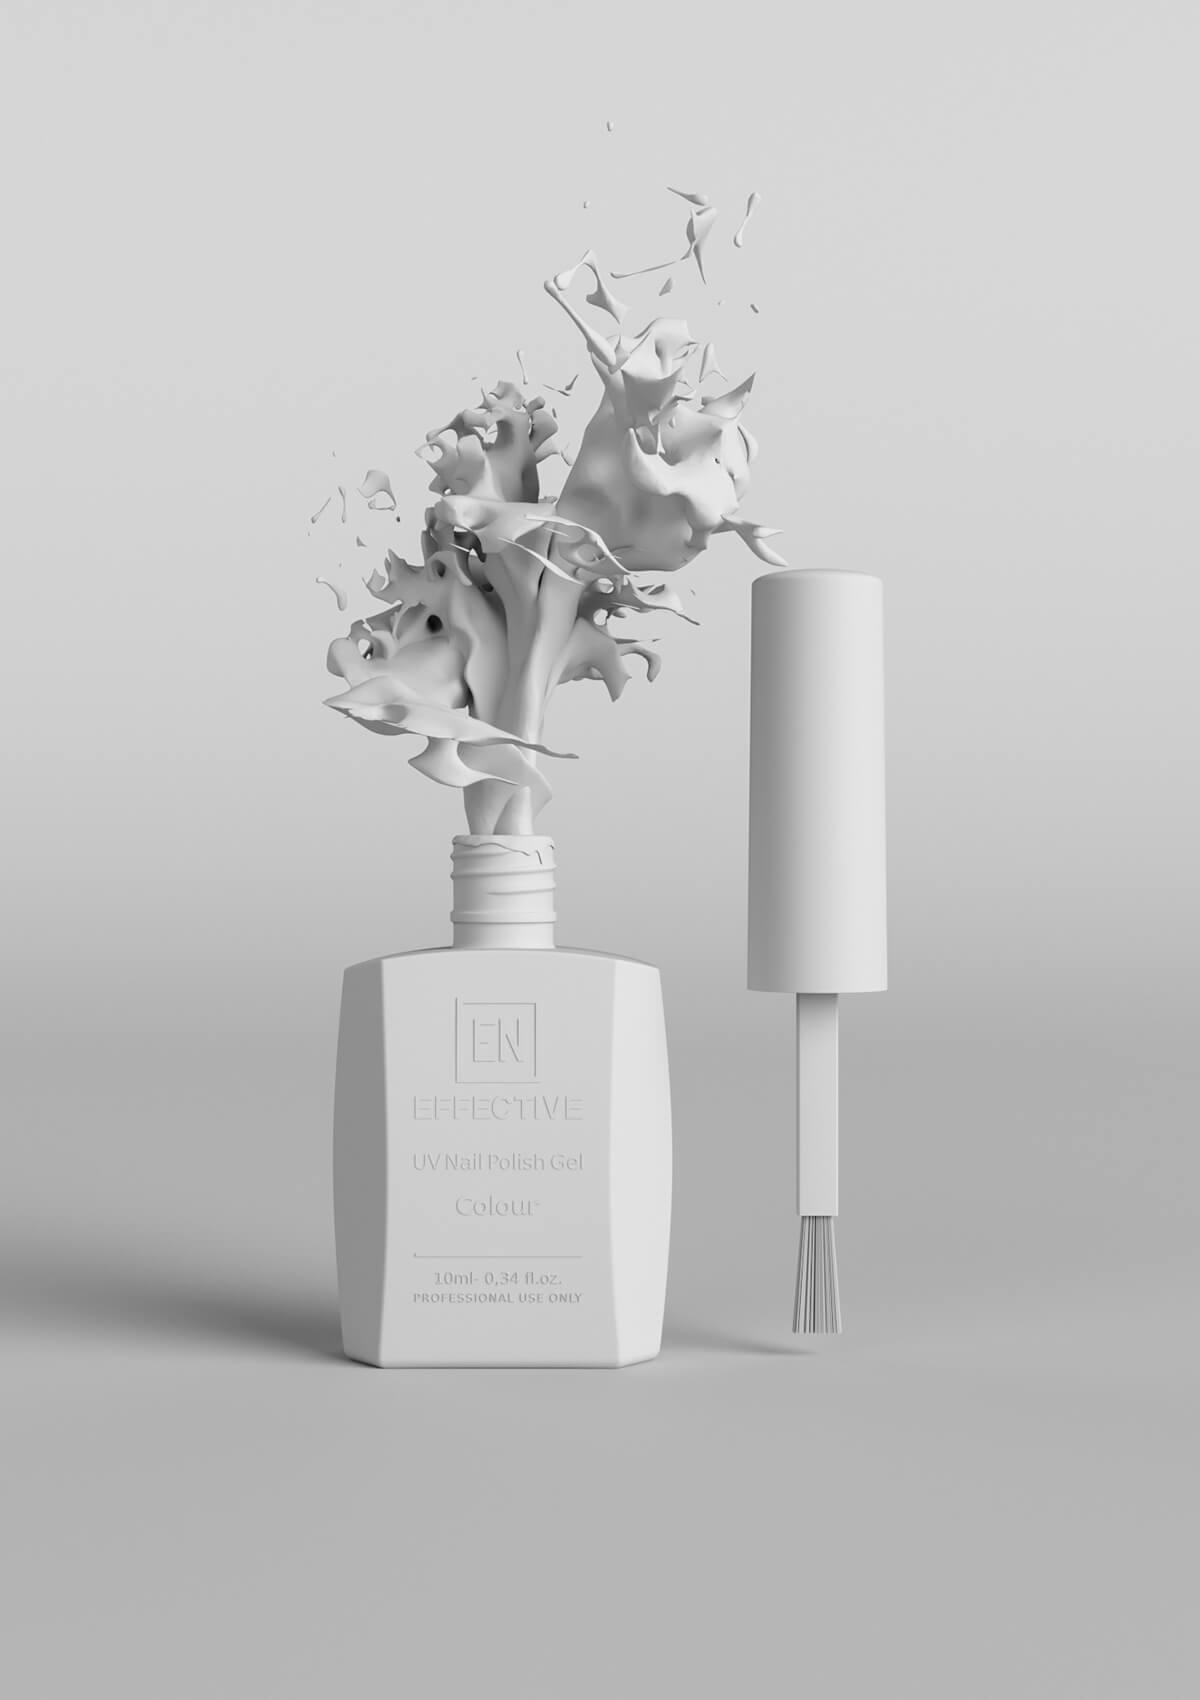 uv nail polish gel 3d product visualization clay render